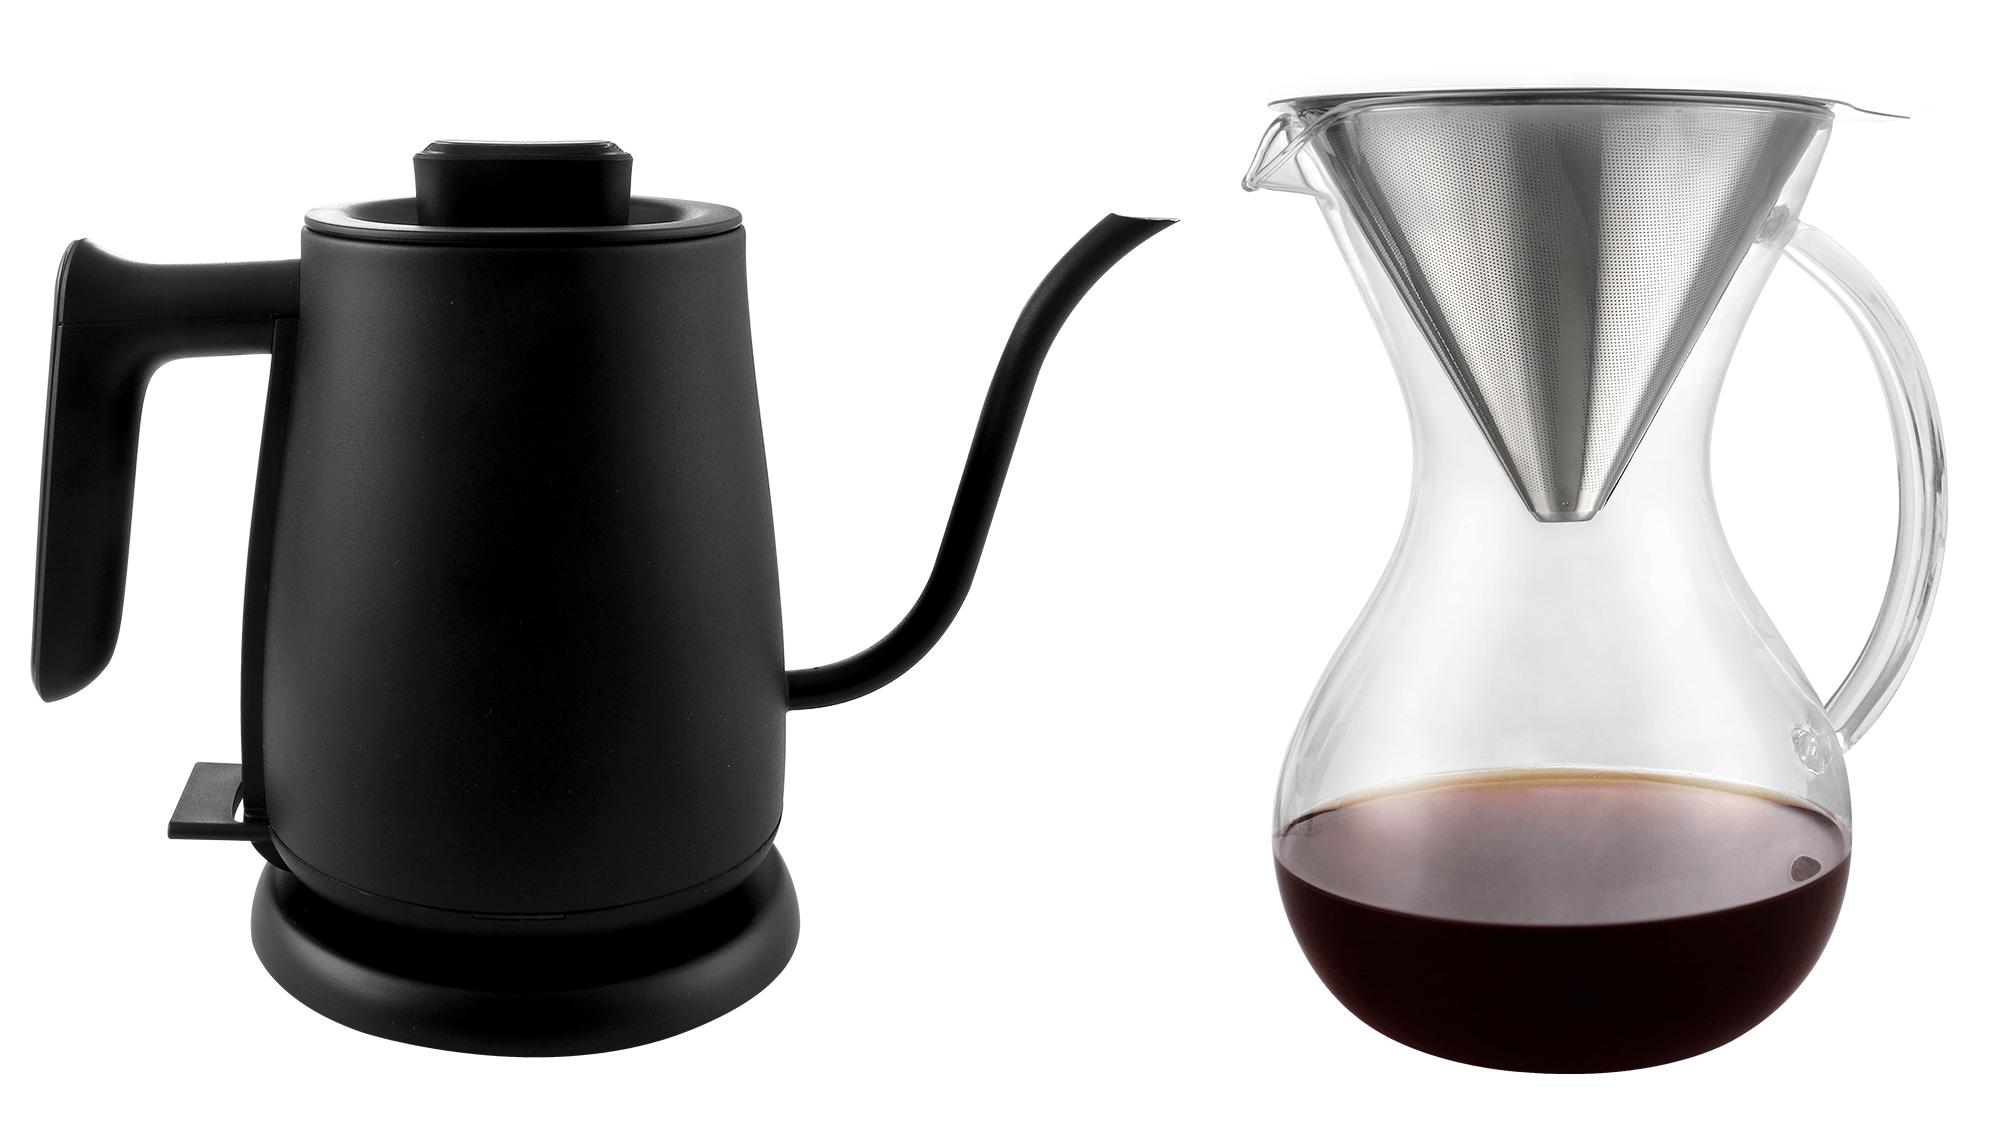 Barletta Pour Over vannkoker + Pour Over glasskanne